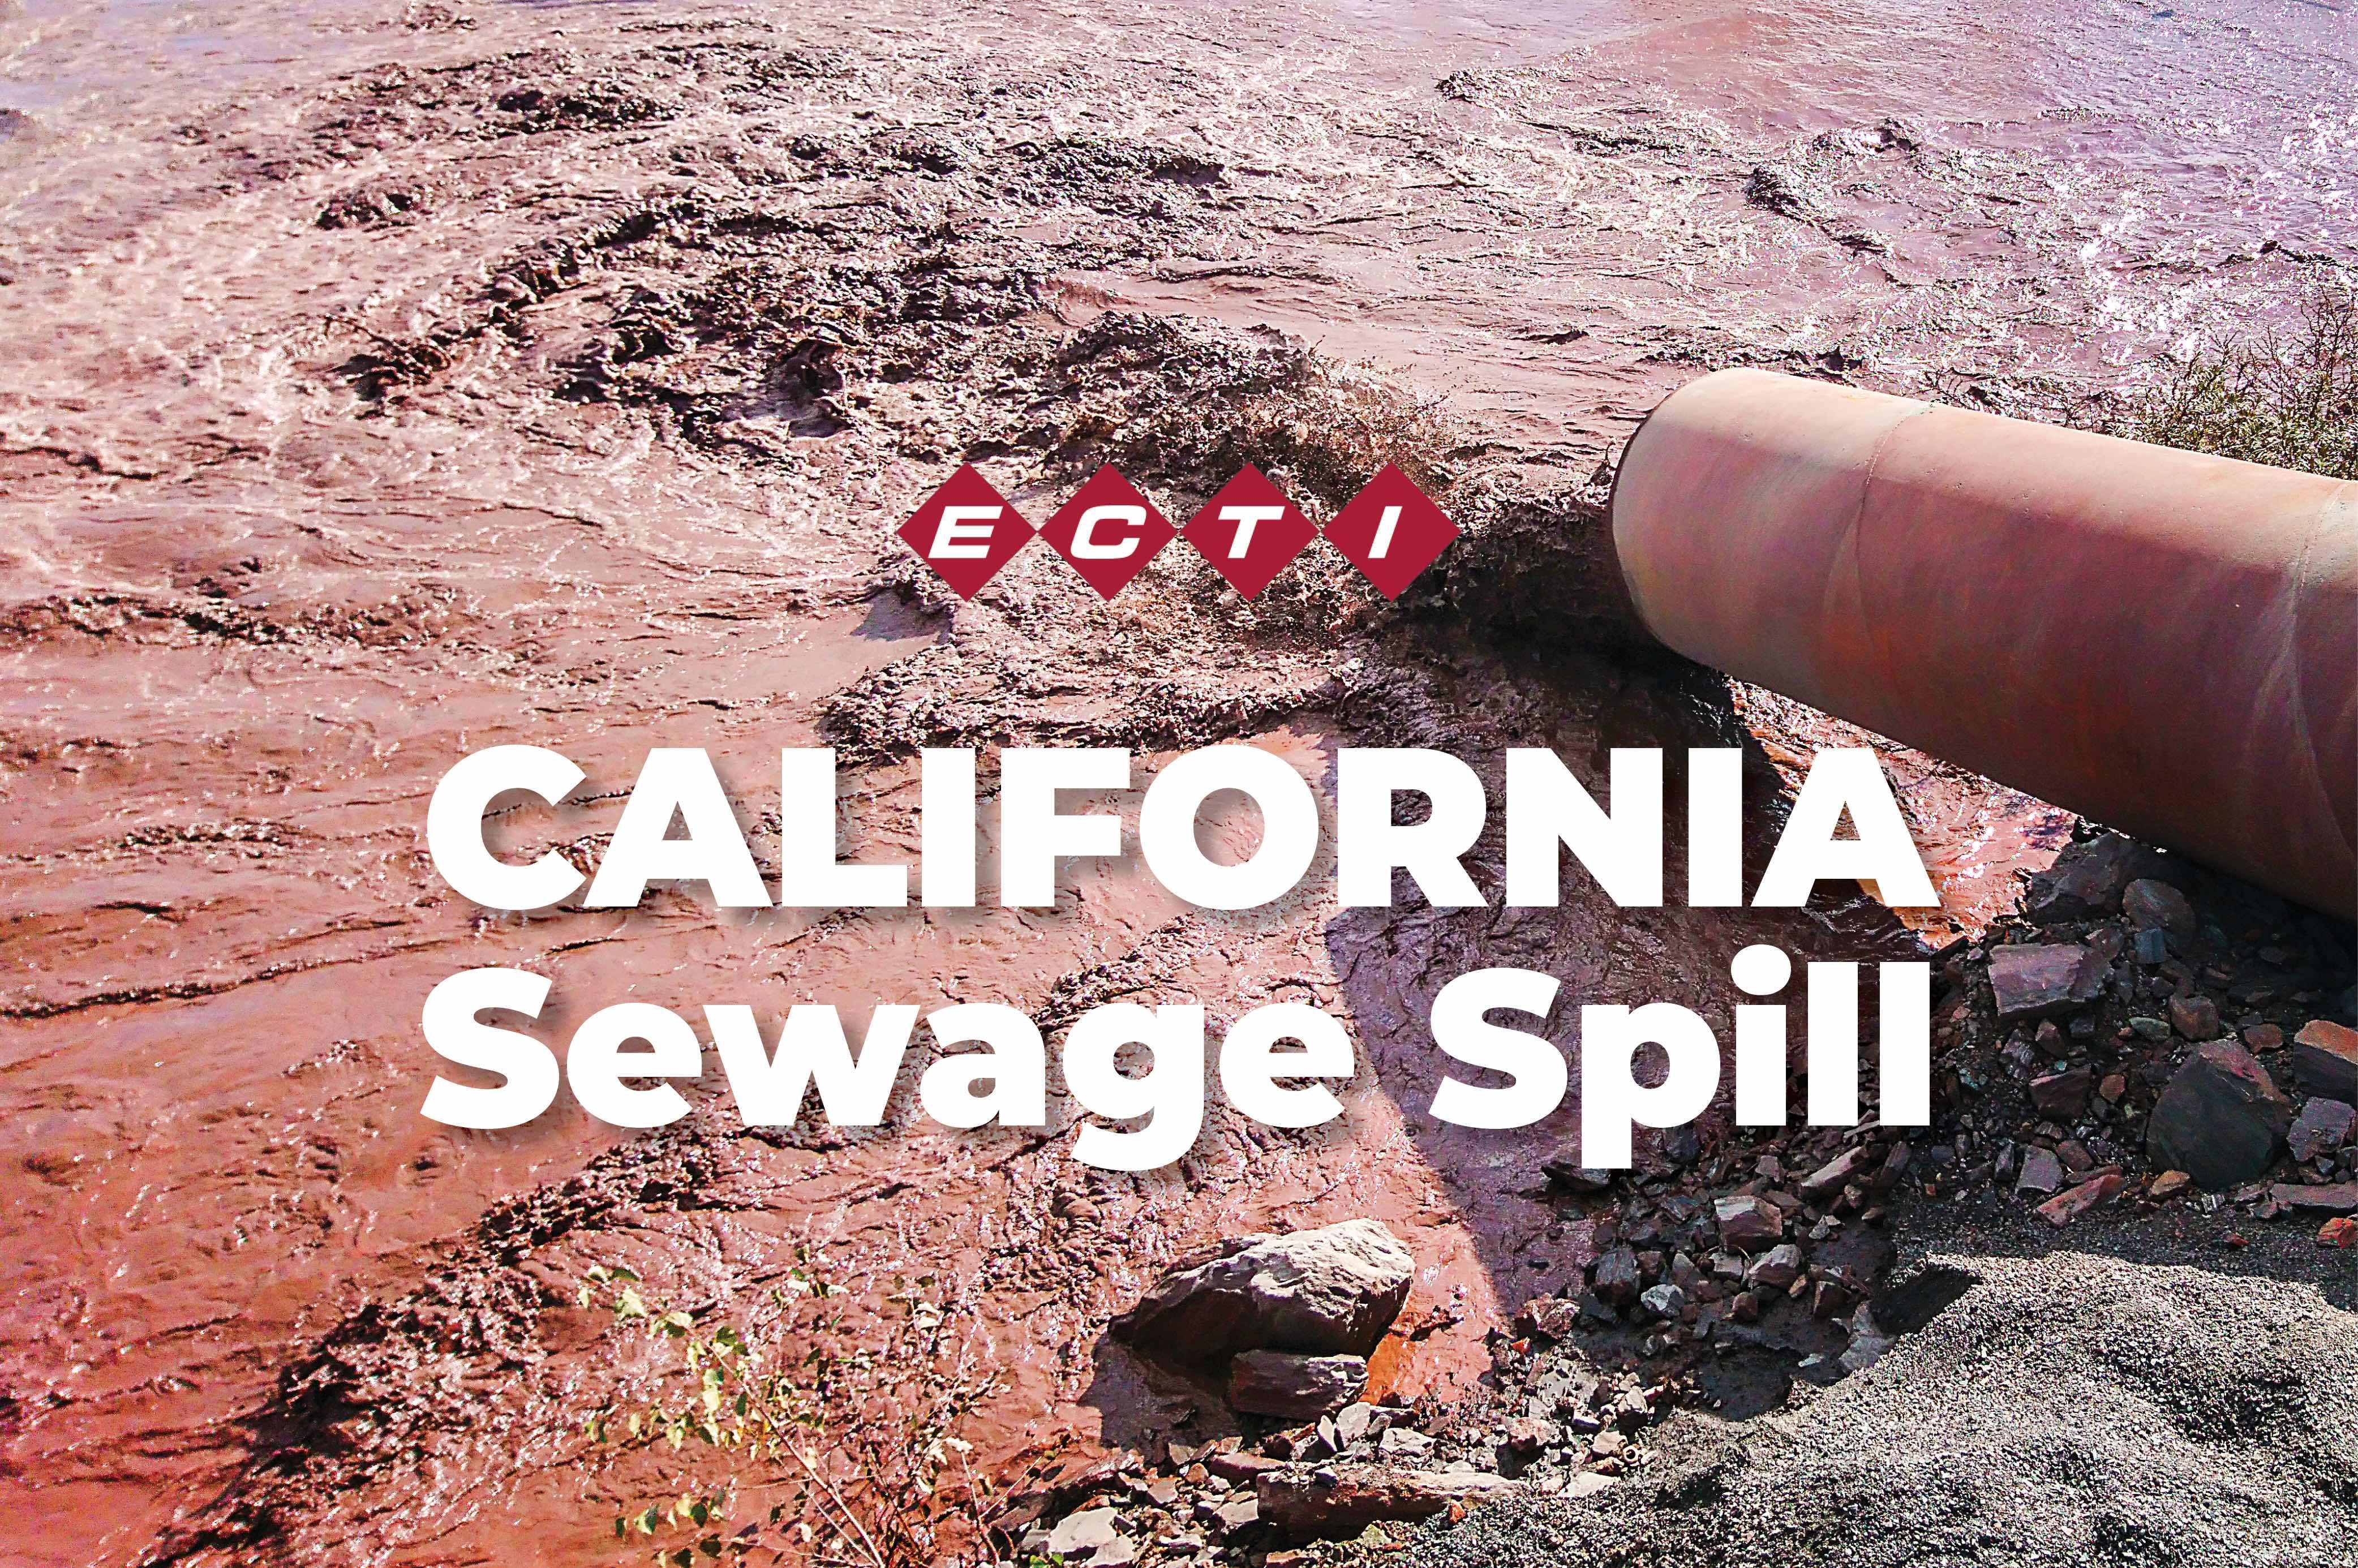 California Sewage Spill